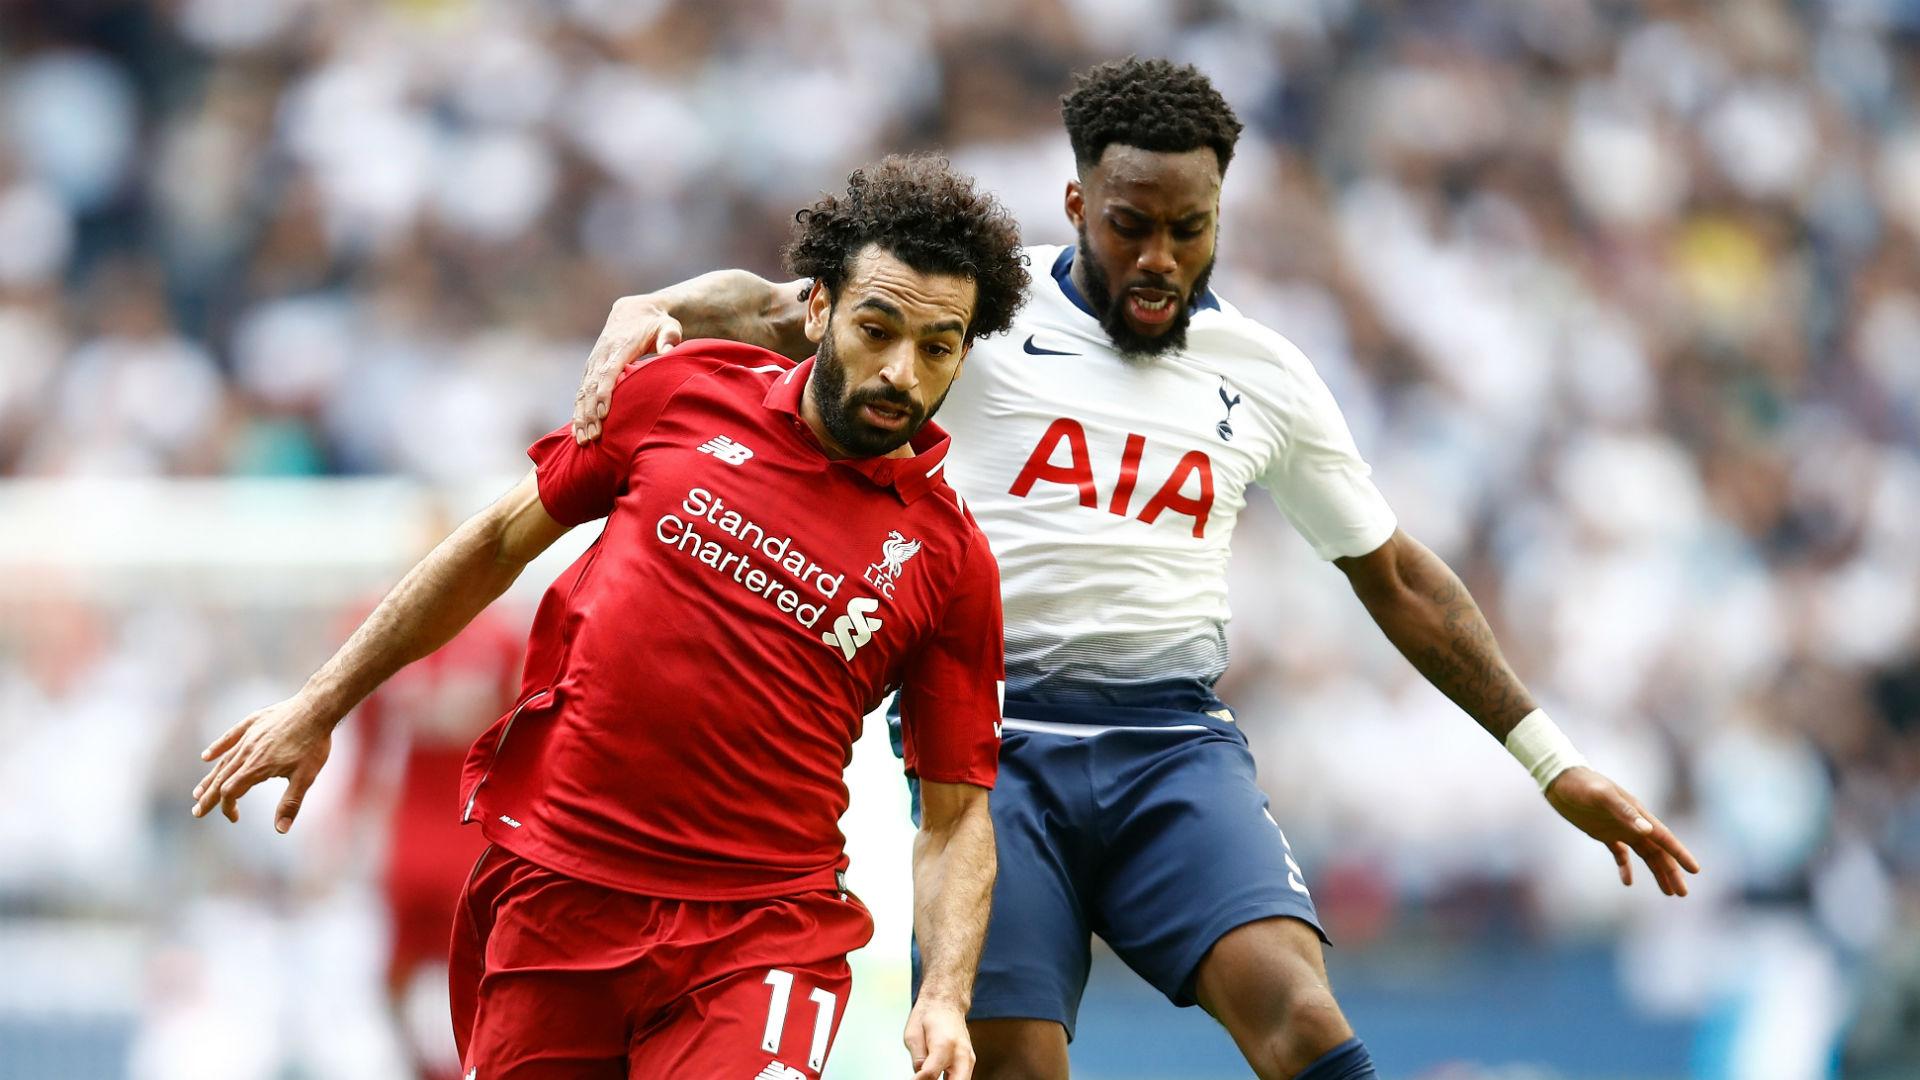 Mohamed Salah Liverpool v Spurs 2018-19